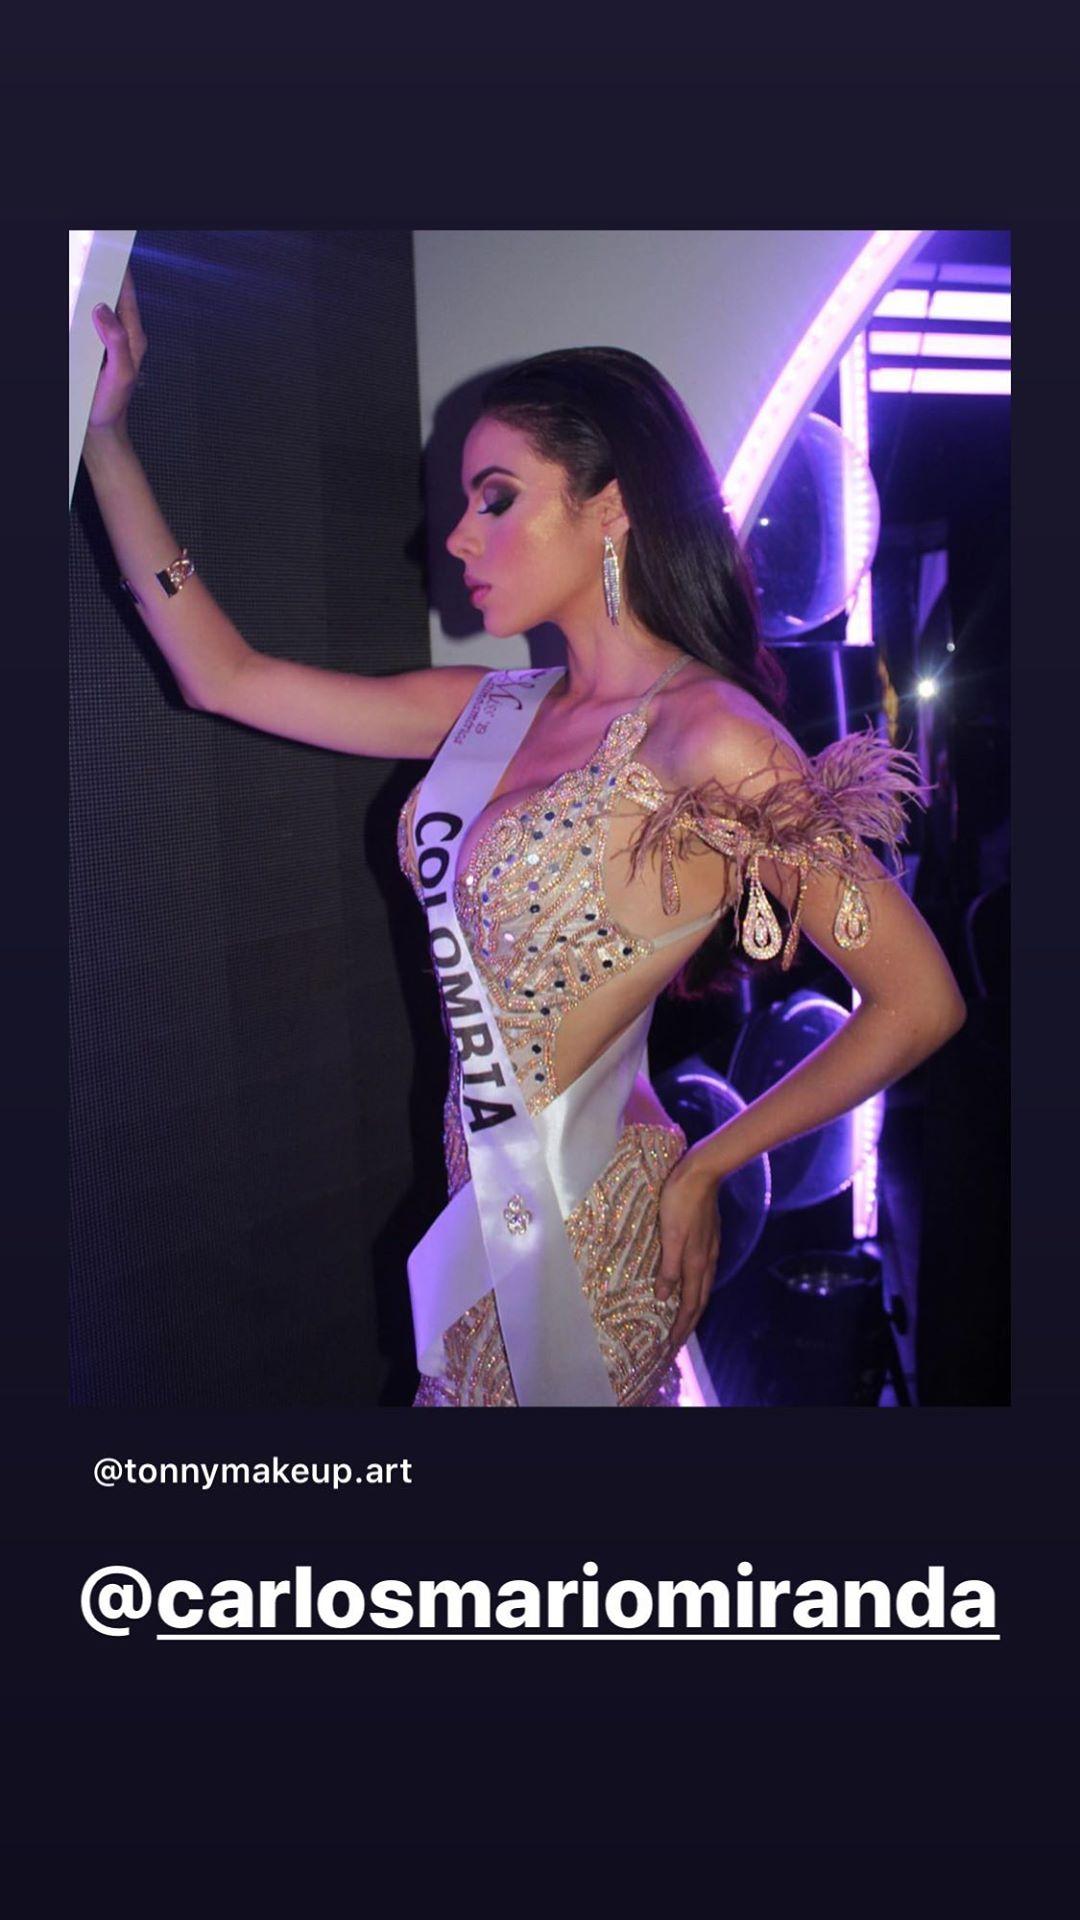 gina aguirre, virreyna de miss latinoamerica 2019. - Página 6 69328010